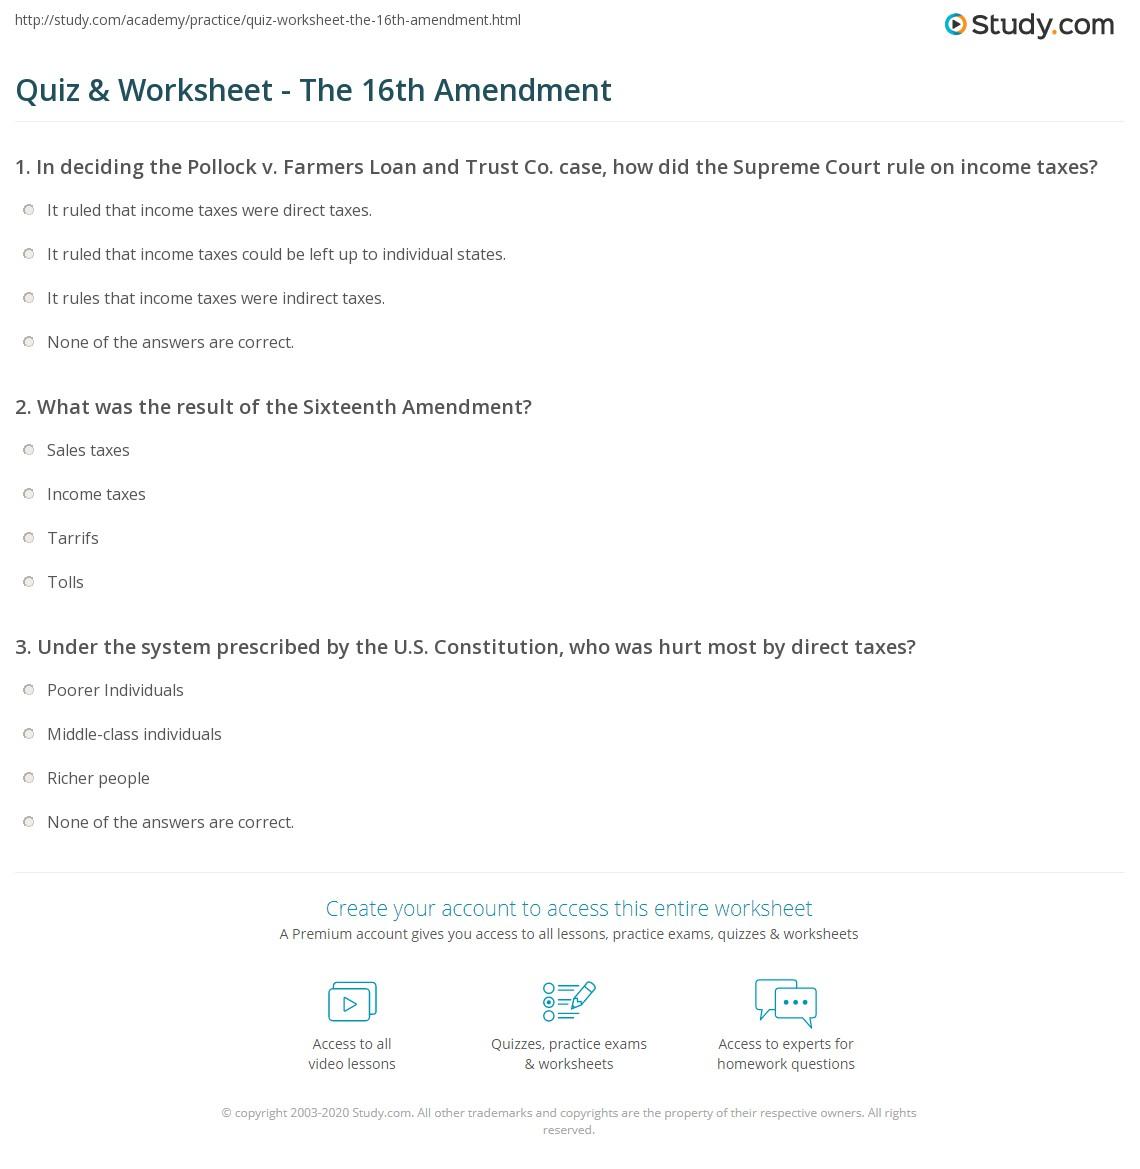 Print The 16th Amendment: Definition, Summary & Ratification Worksheet